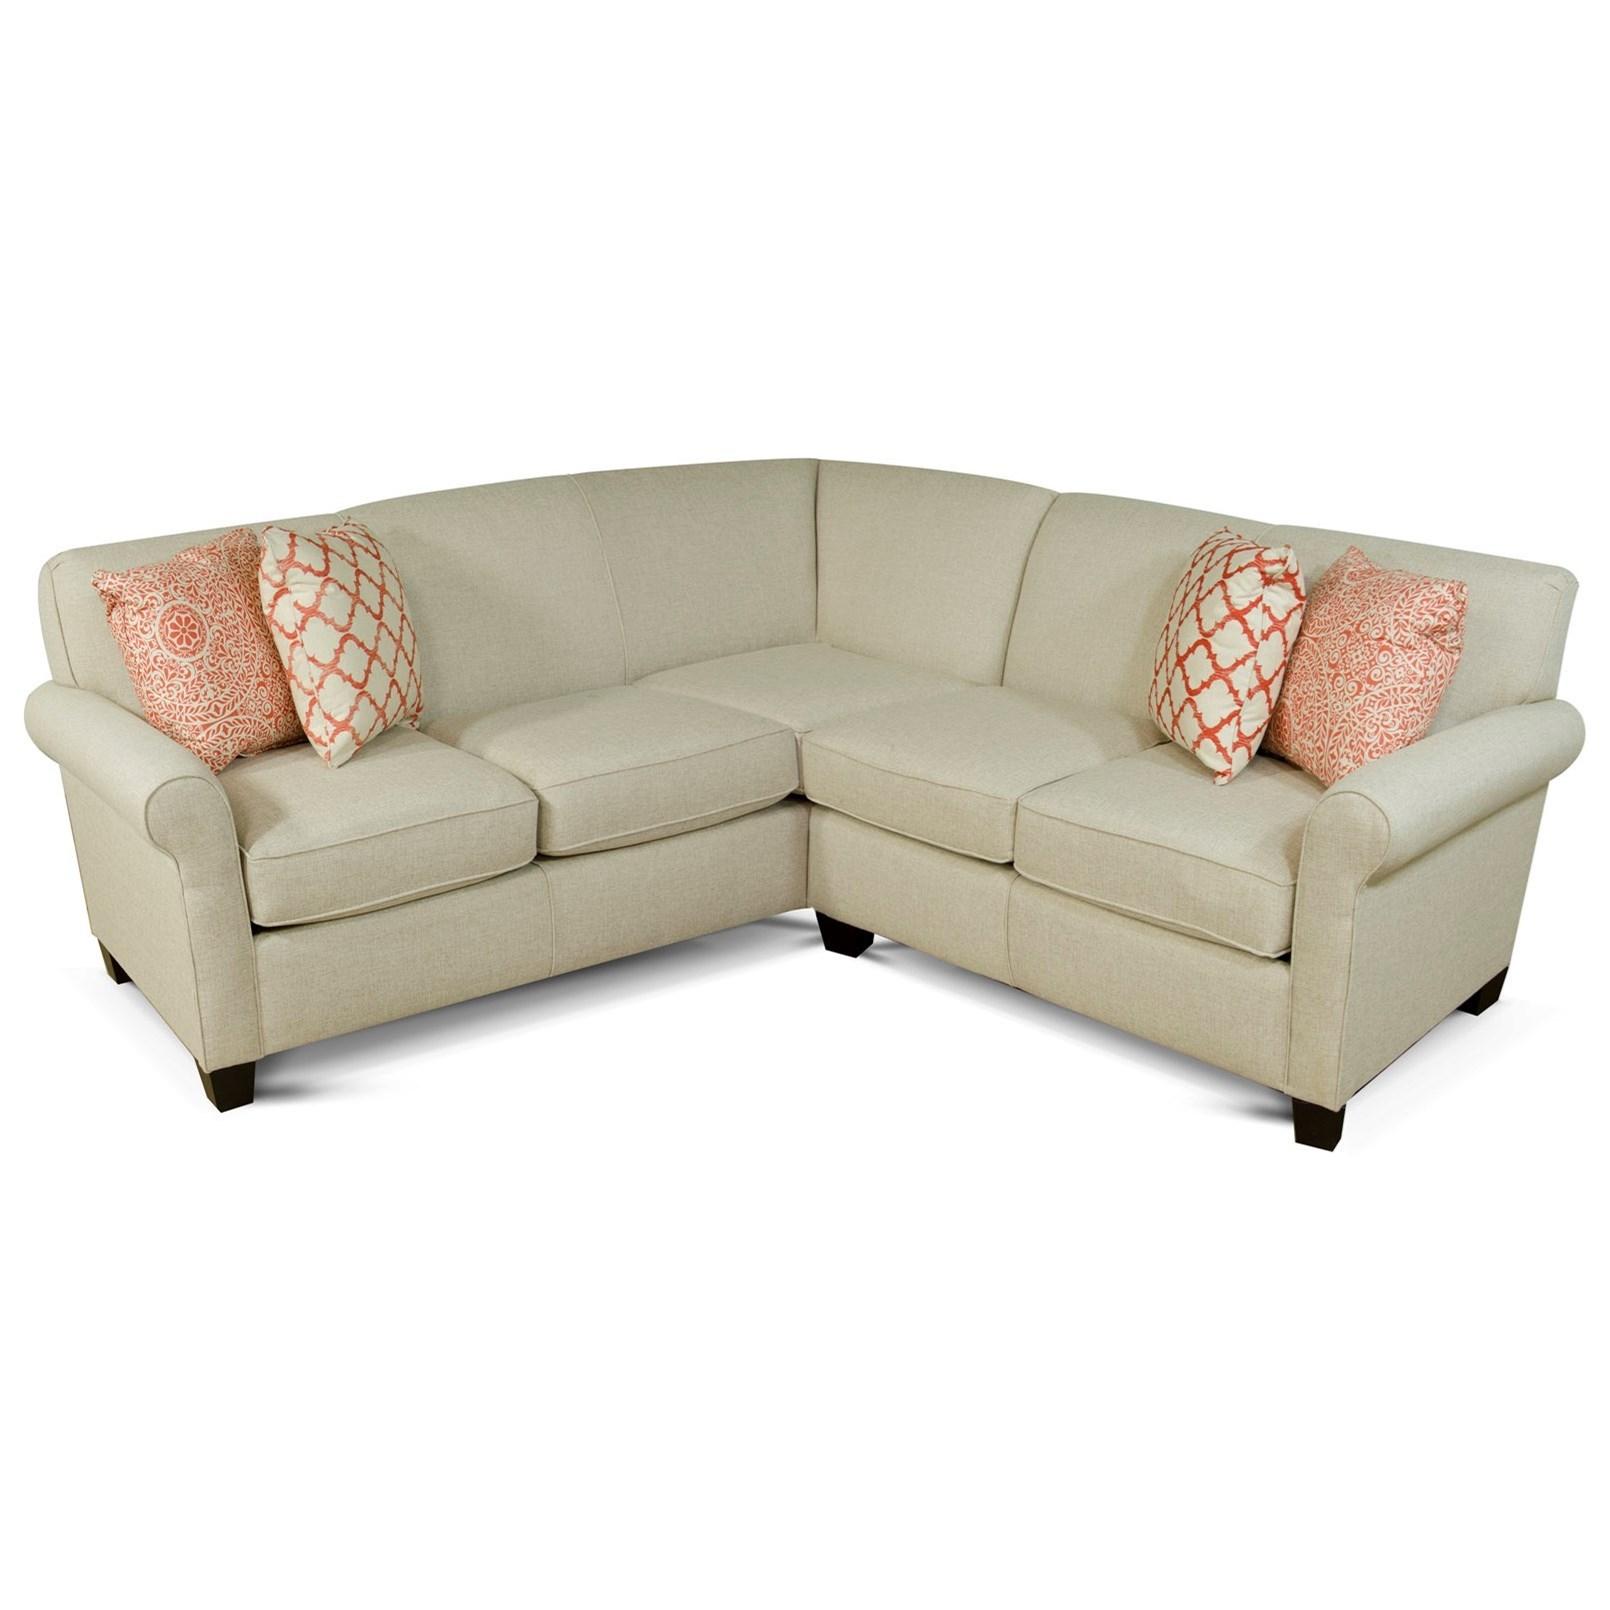 england angie small corner sectional sofa pilgrim furniture city rh pilgrimfurniturecity com